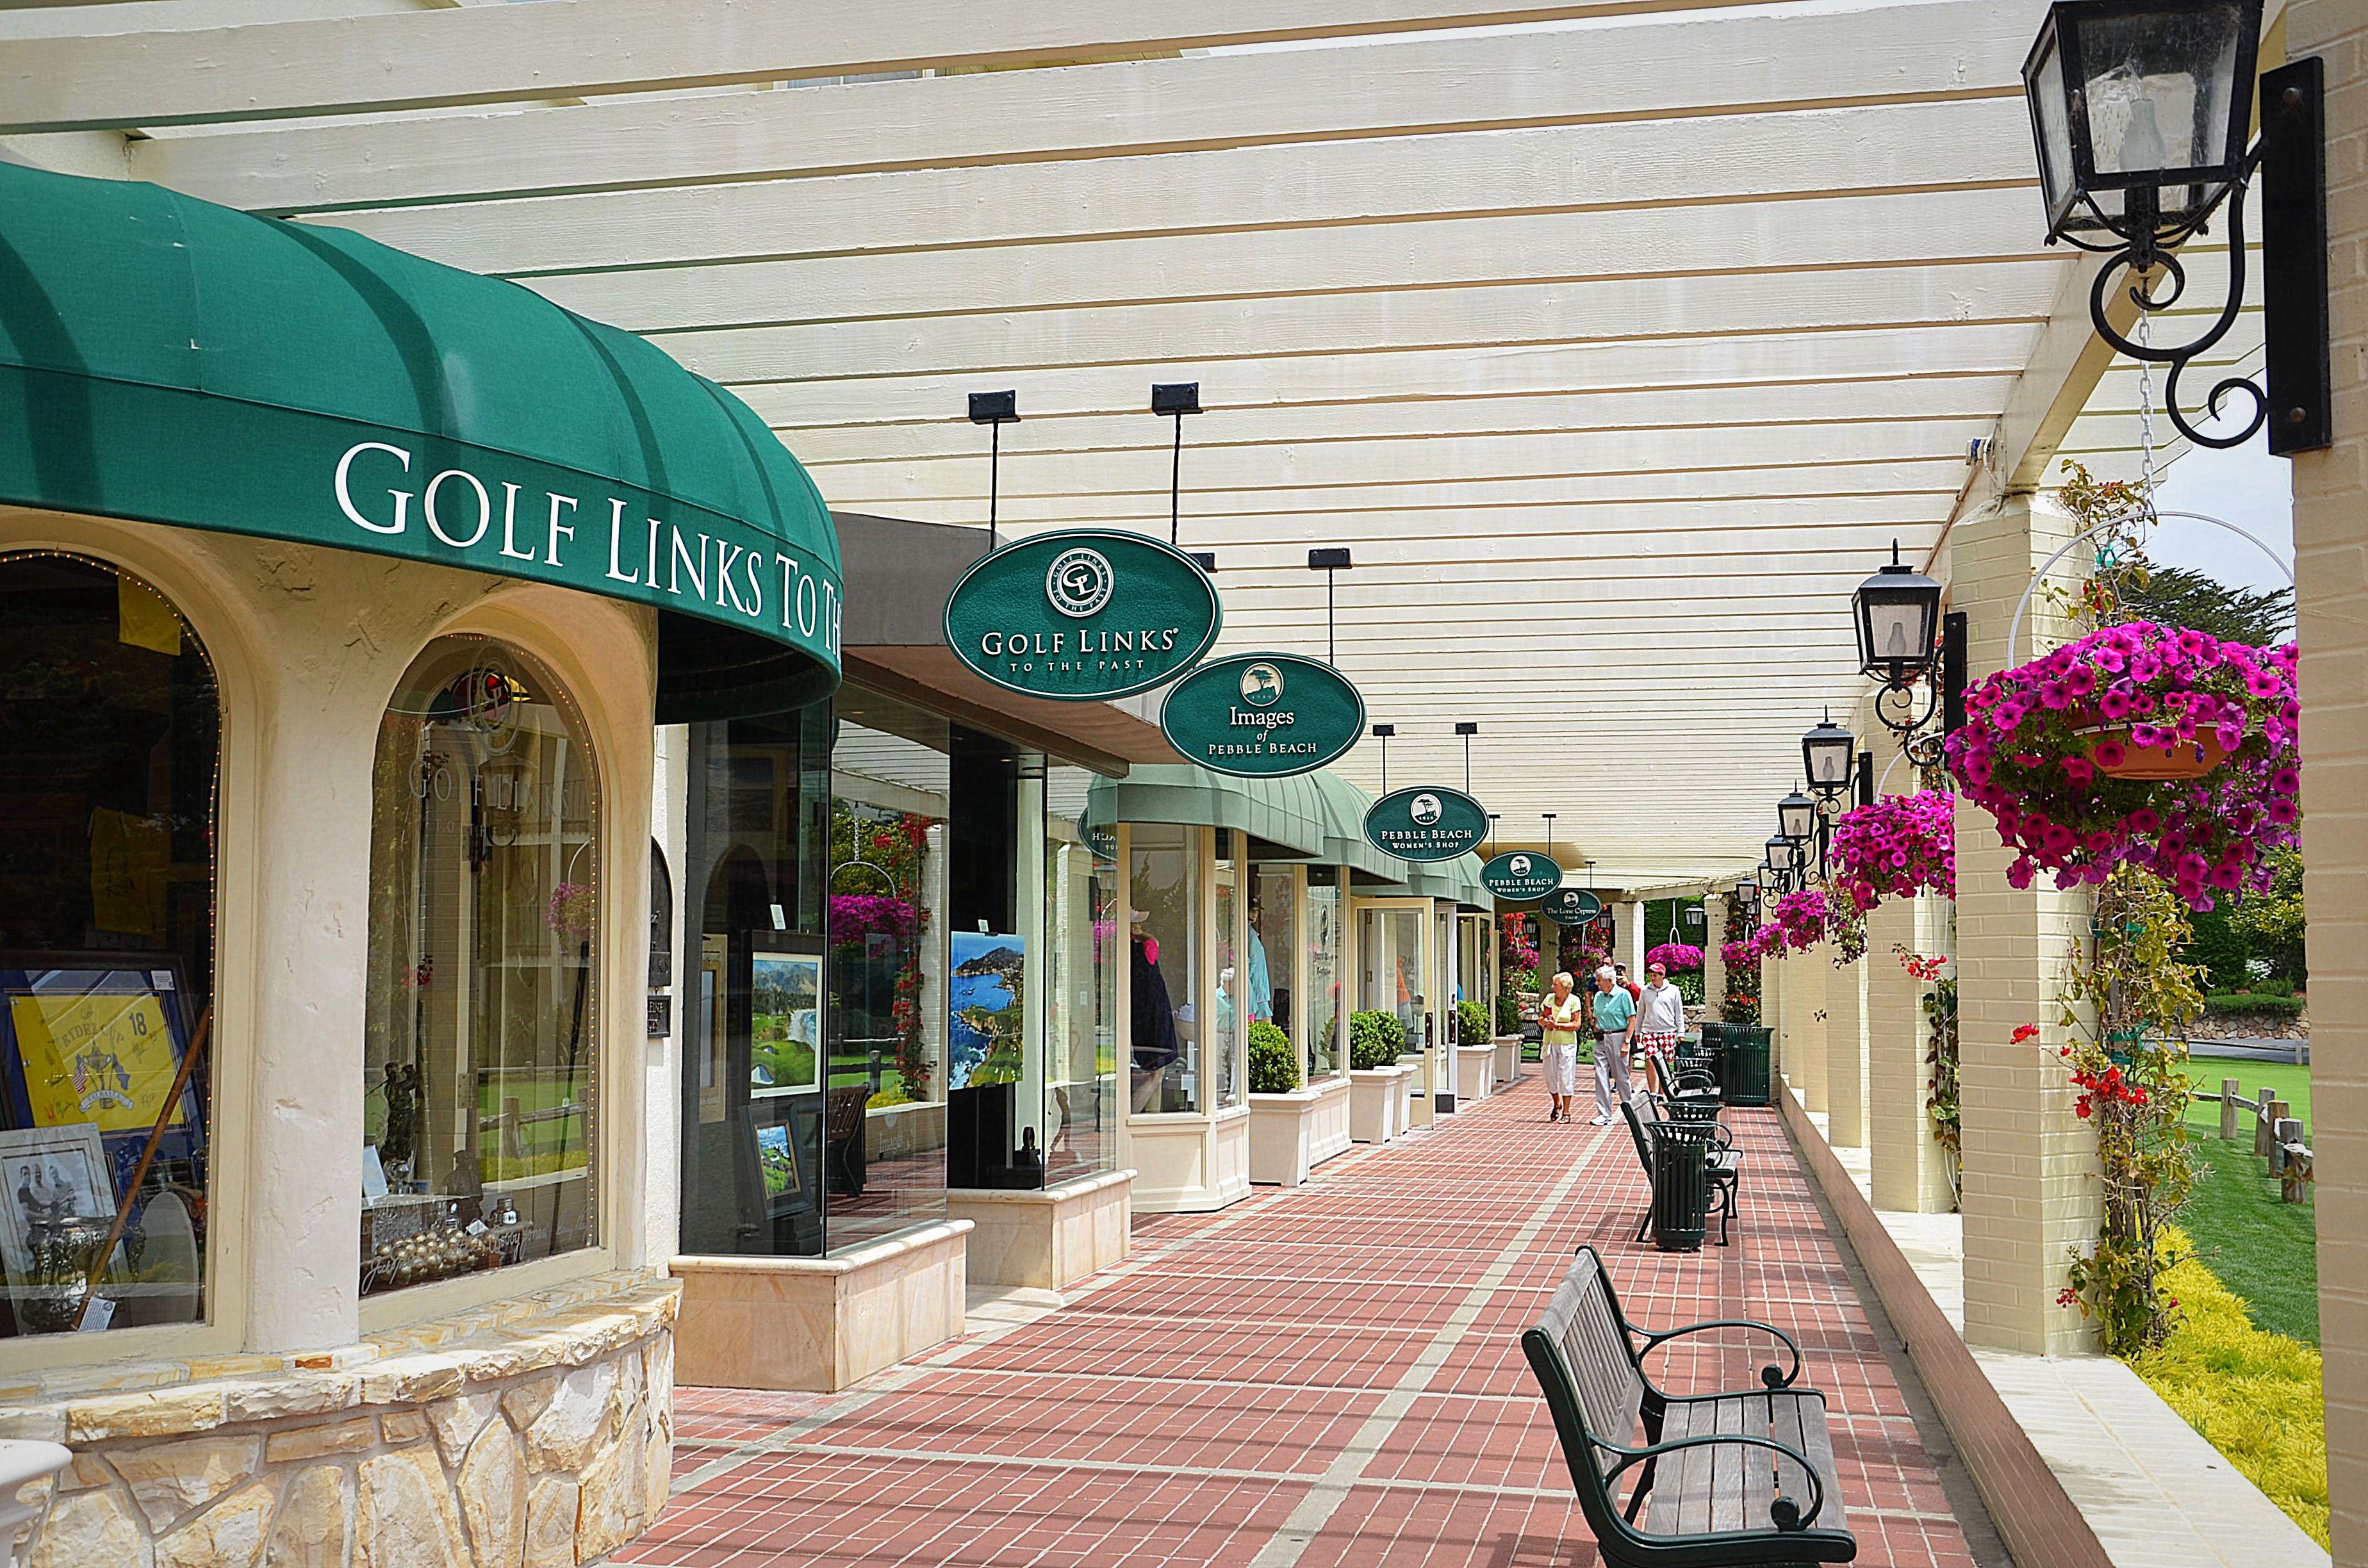 Casa palmero pebble beach no ordinary resort - Shop on line casa ...